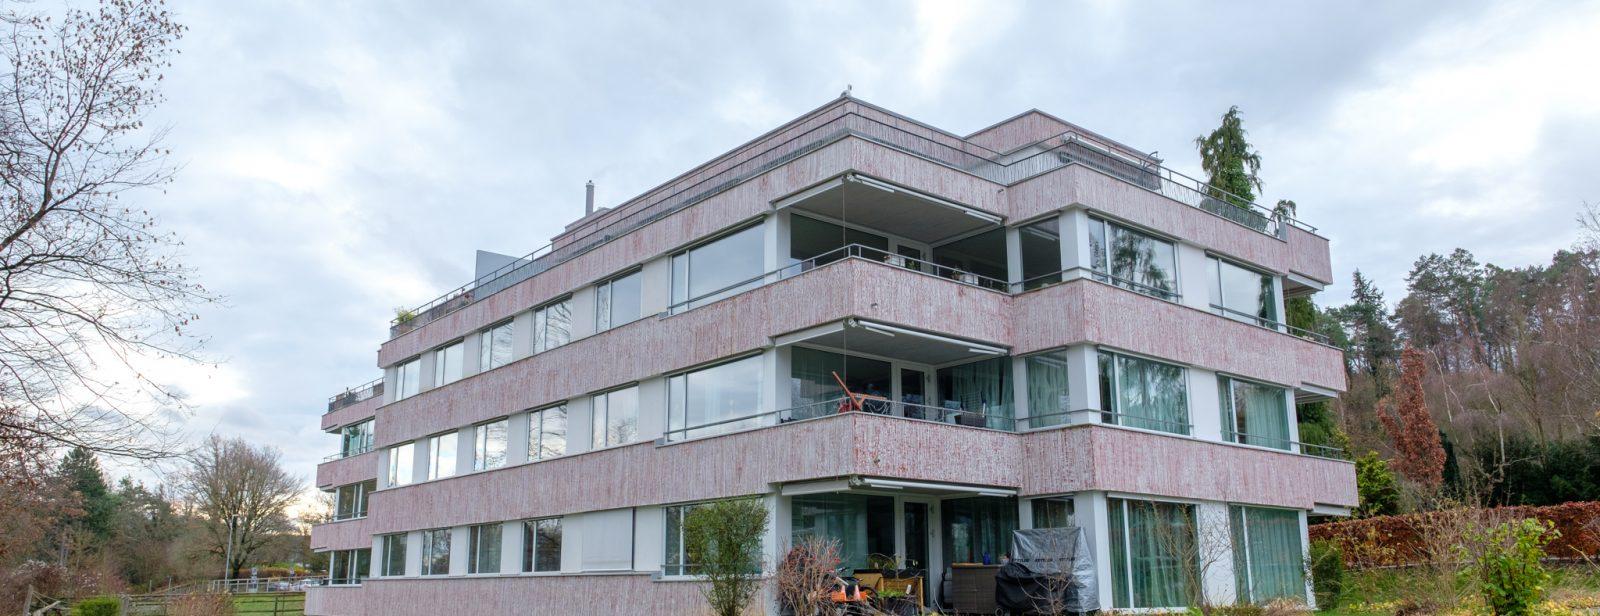 Neubau Mehrfamillienhaus Guggenbühlstrasse, Dietikon